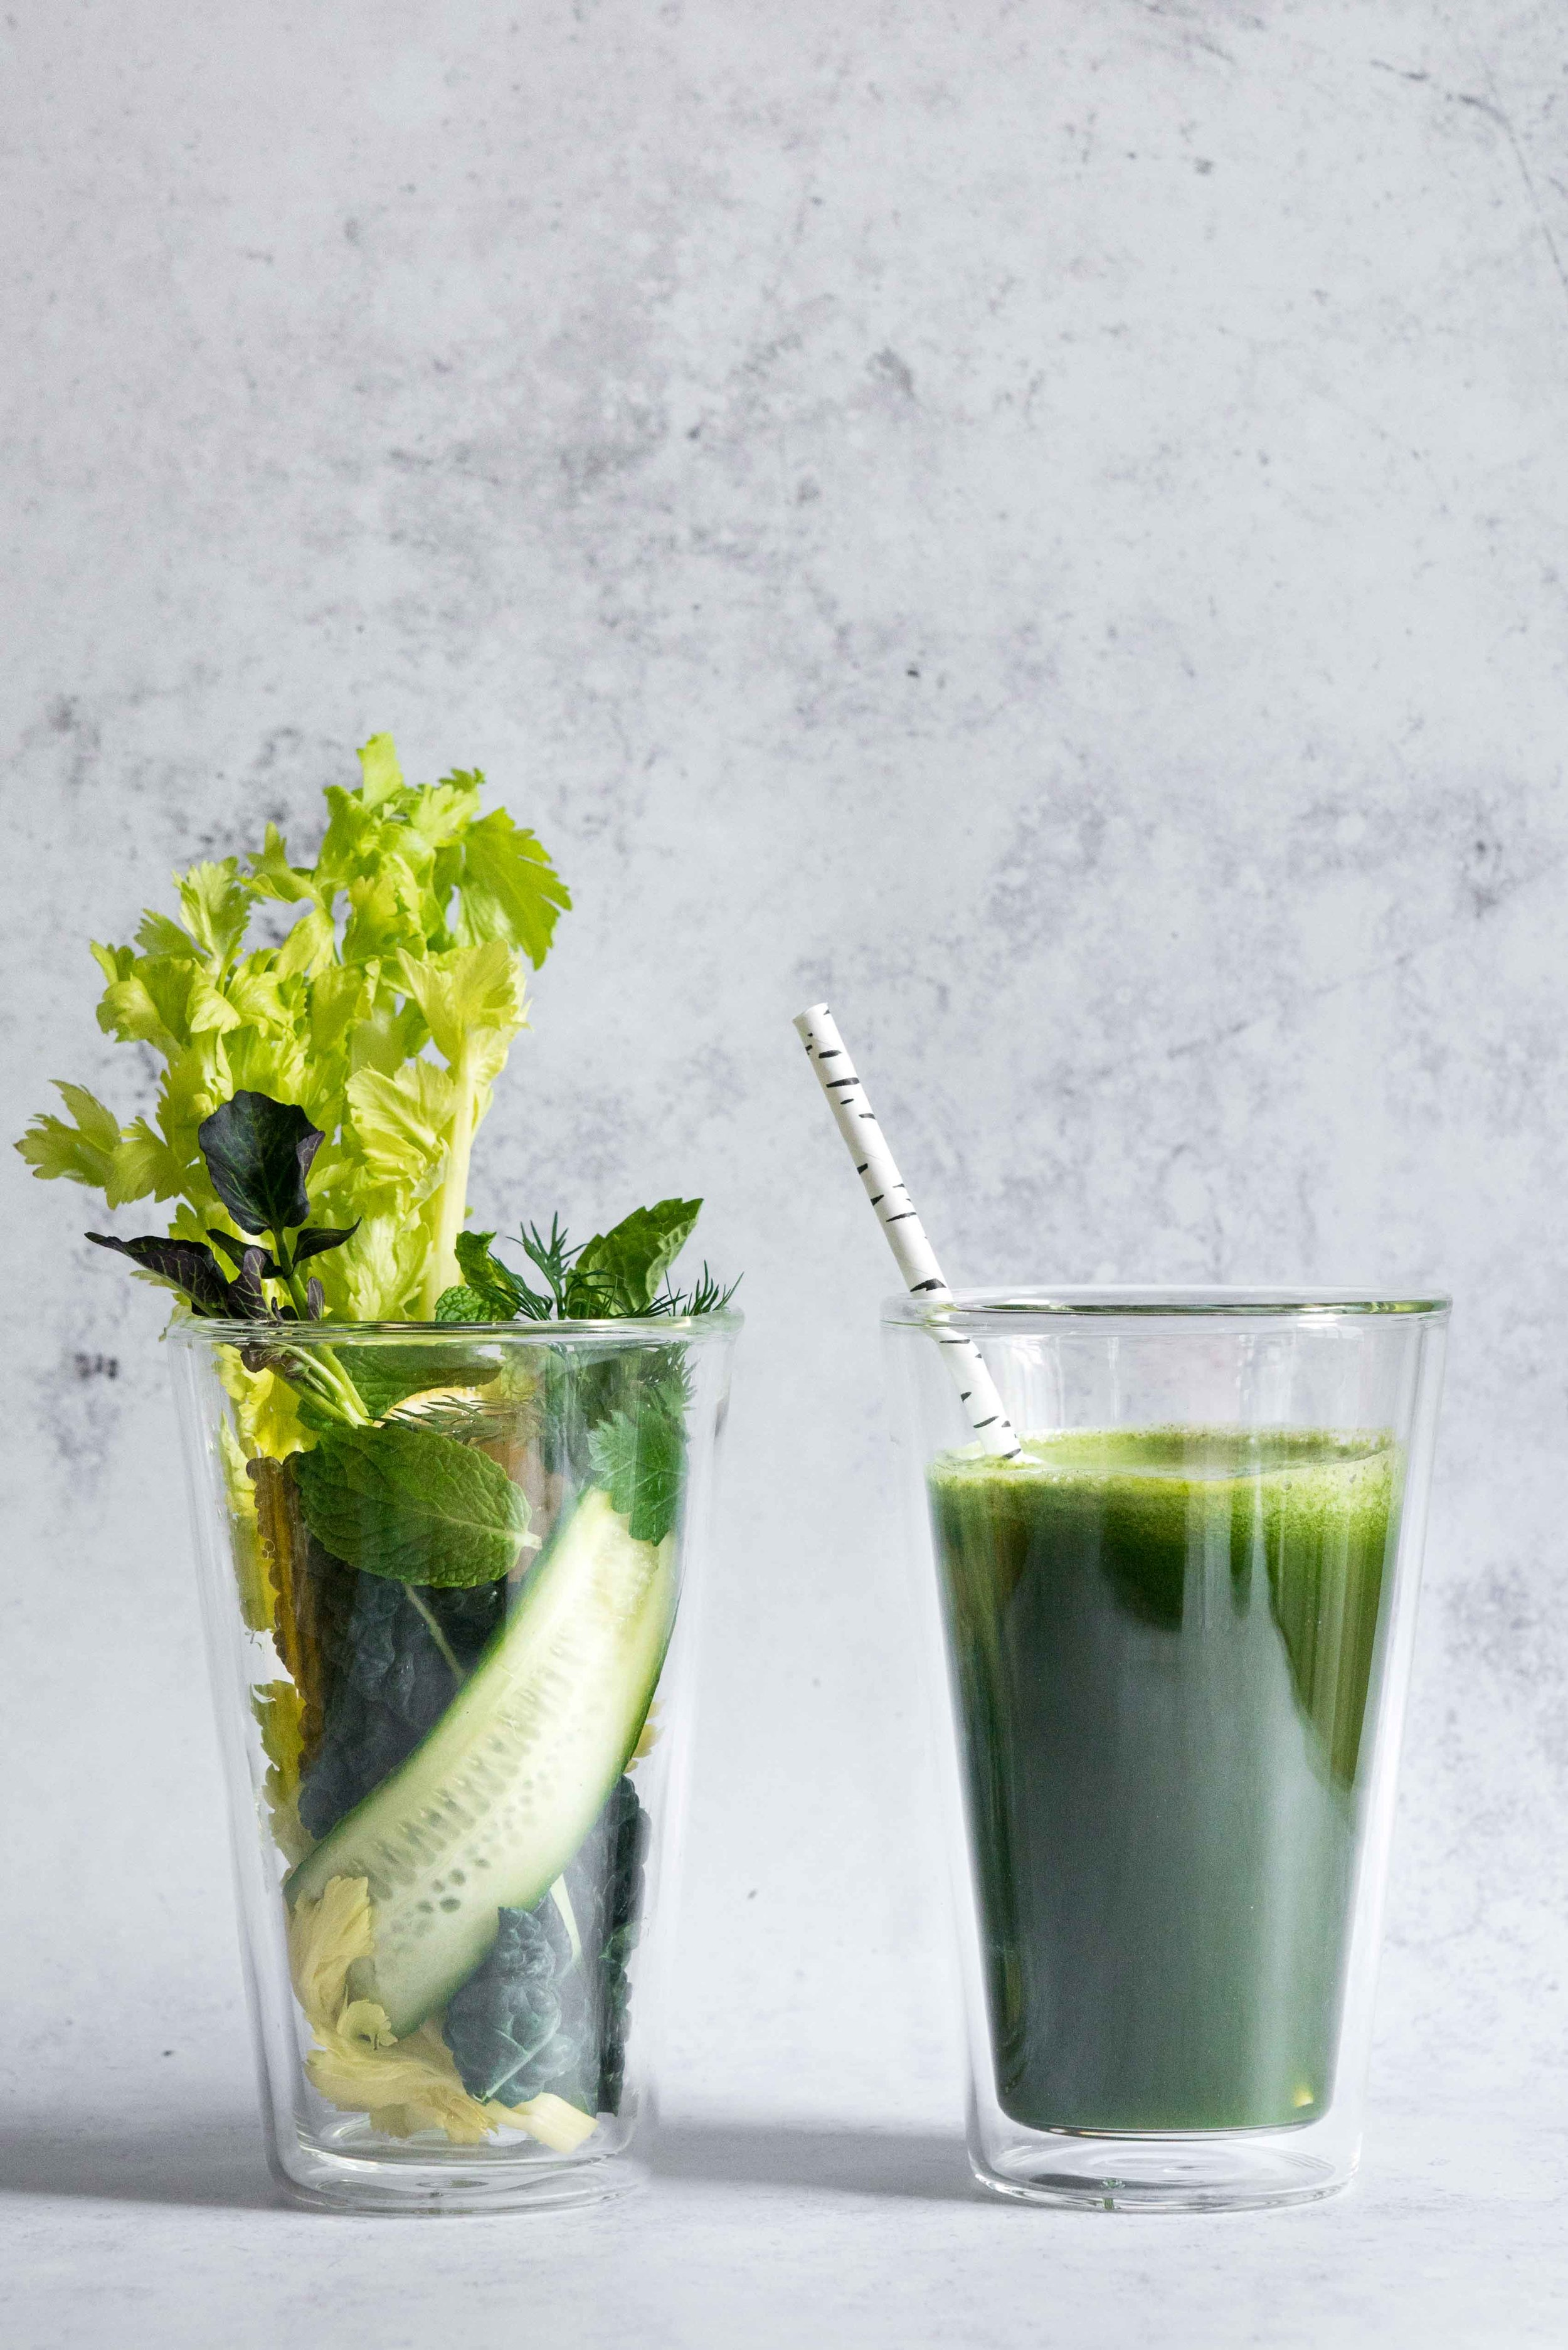 zero waste juicing recipes